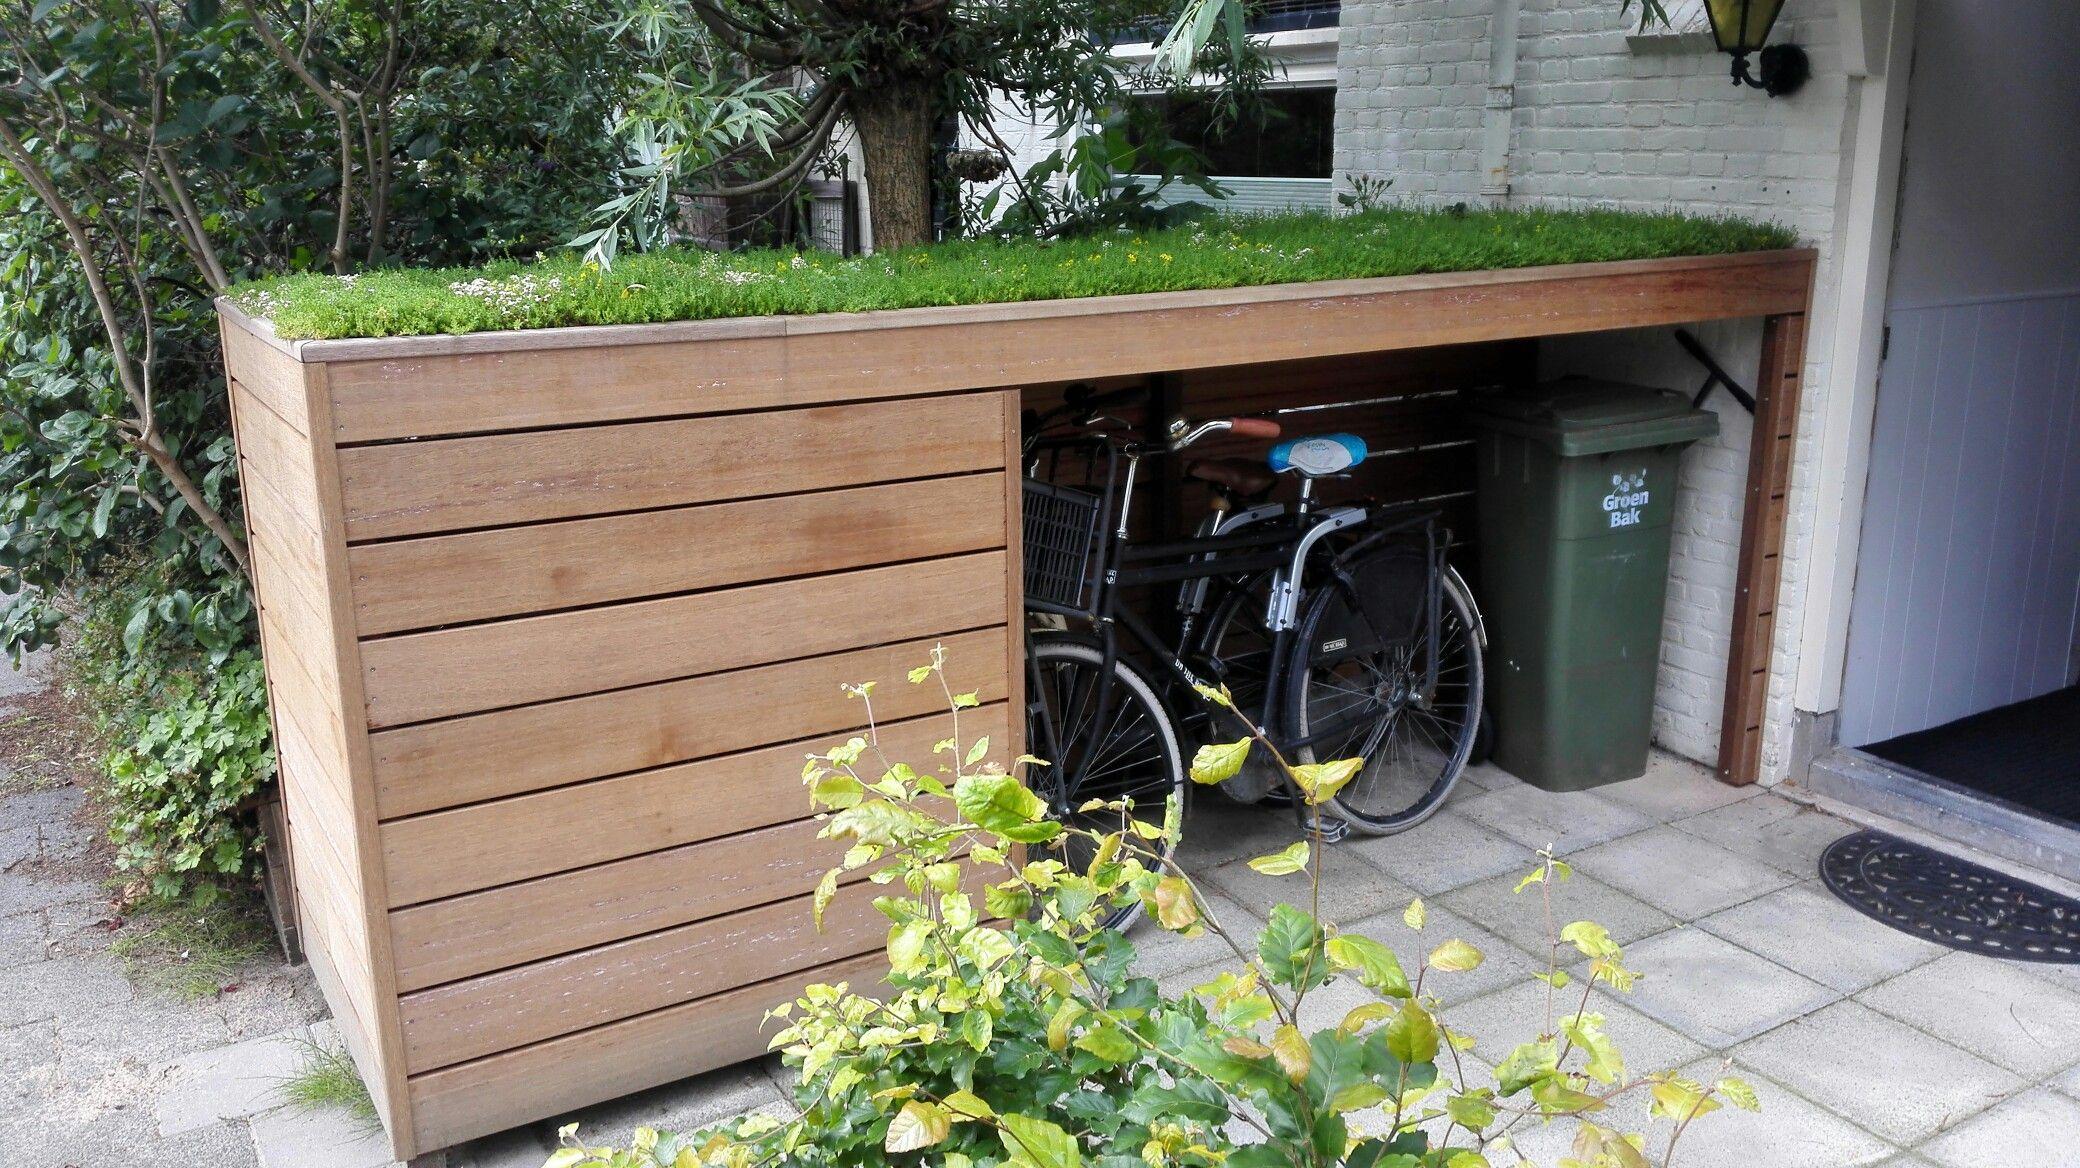 Fietsenberging Met Groen Dak | Abri Vélo, Rangement Terrasse ... pour Abri De Jardin Moderne